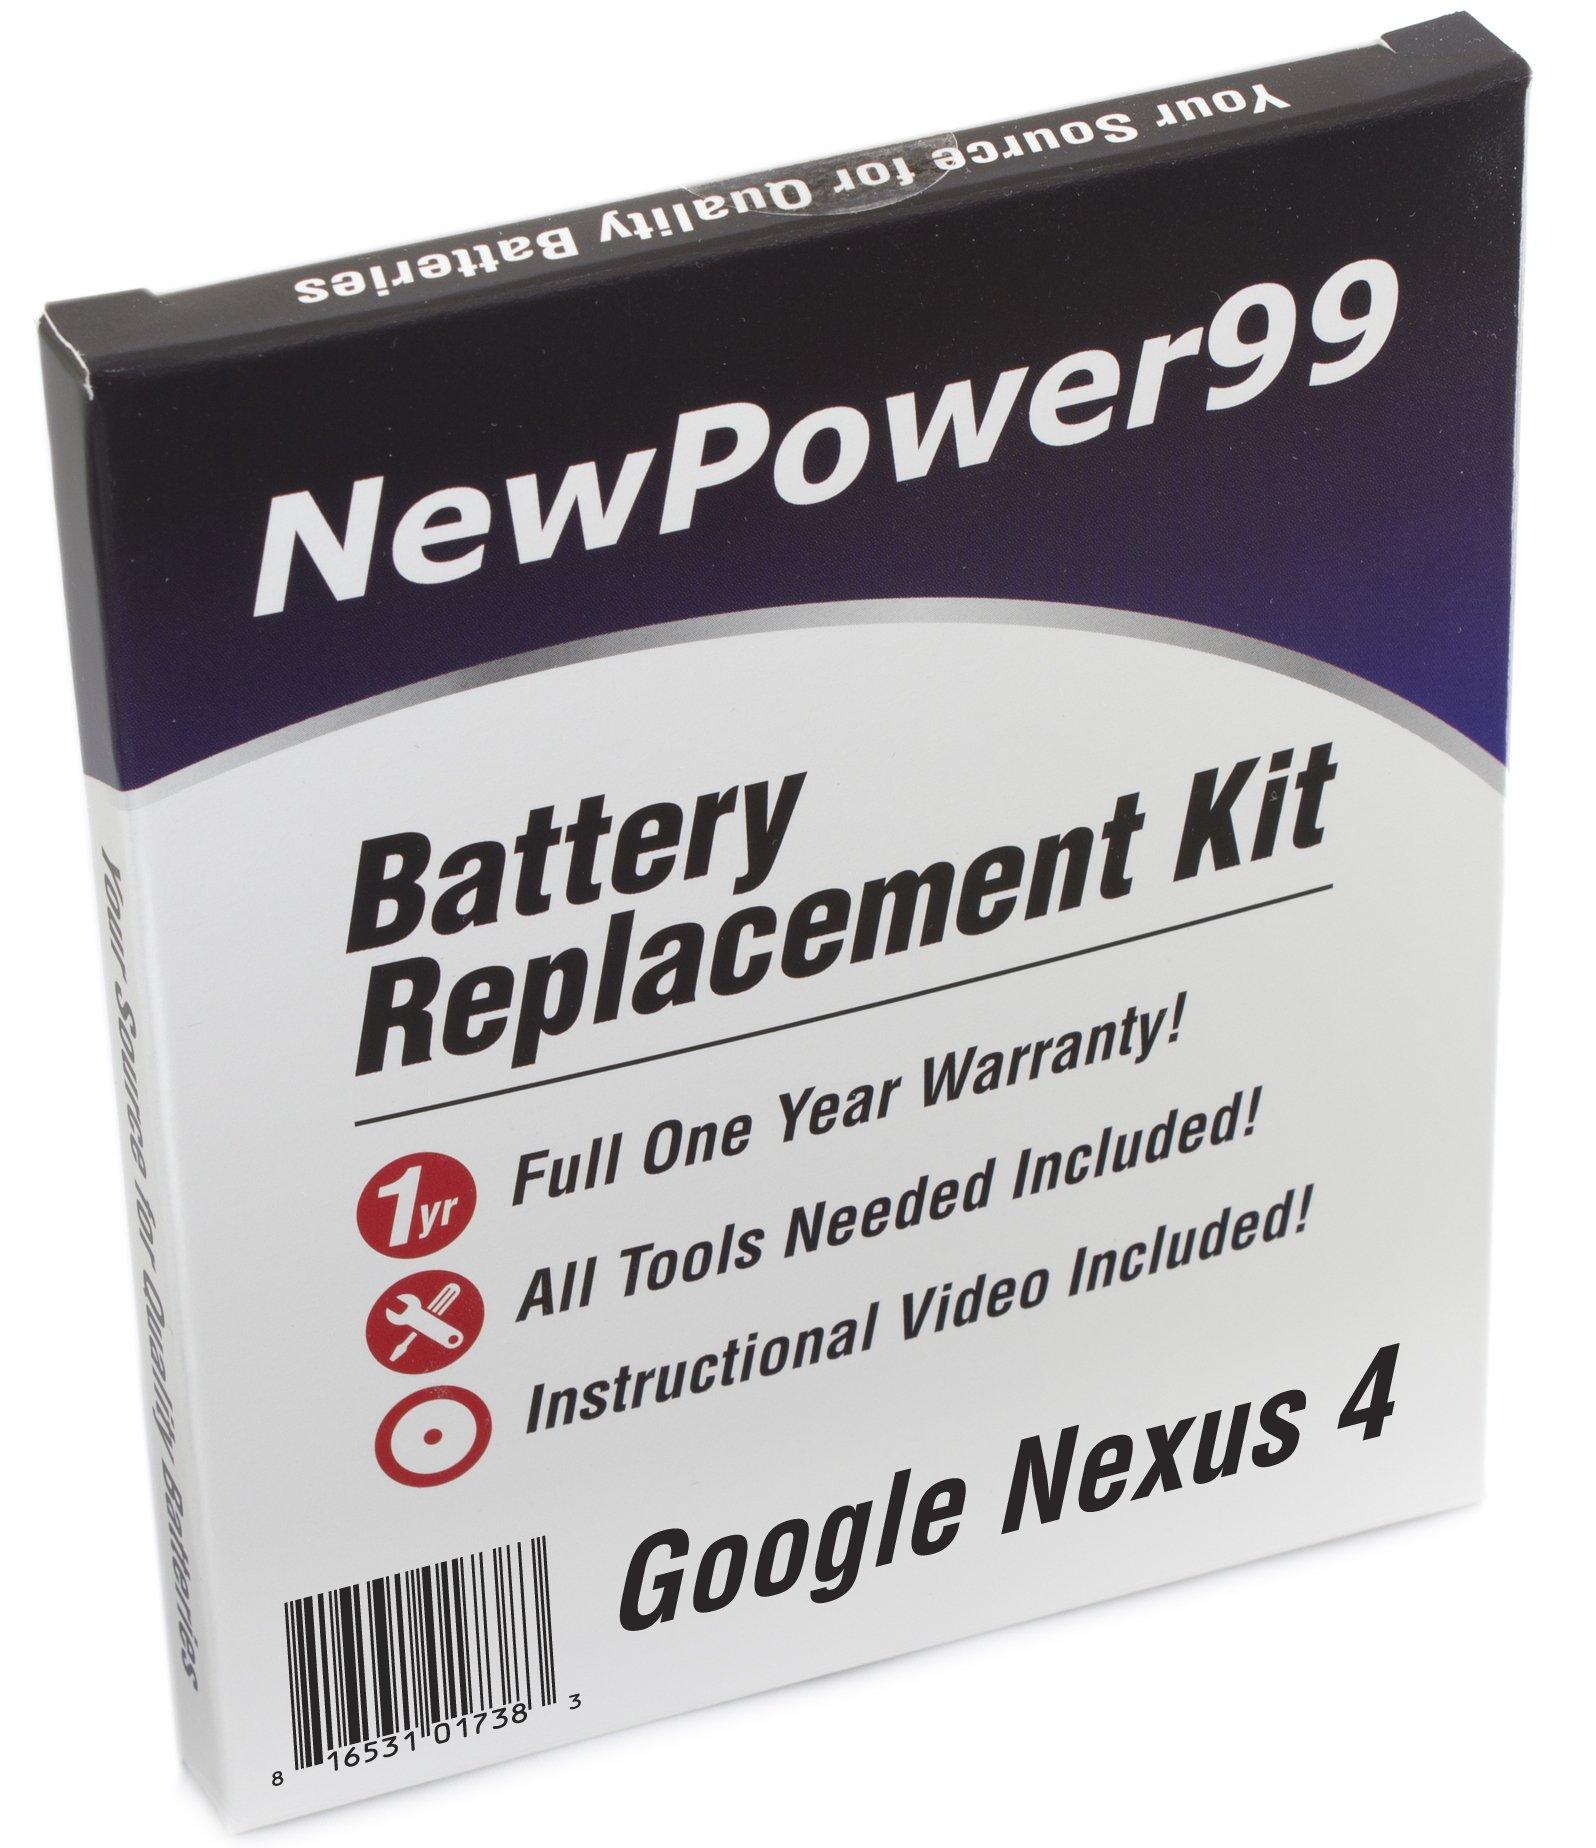 Bateria Celular NewPower99 Kit con Herramientas para Google Nexus 4